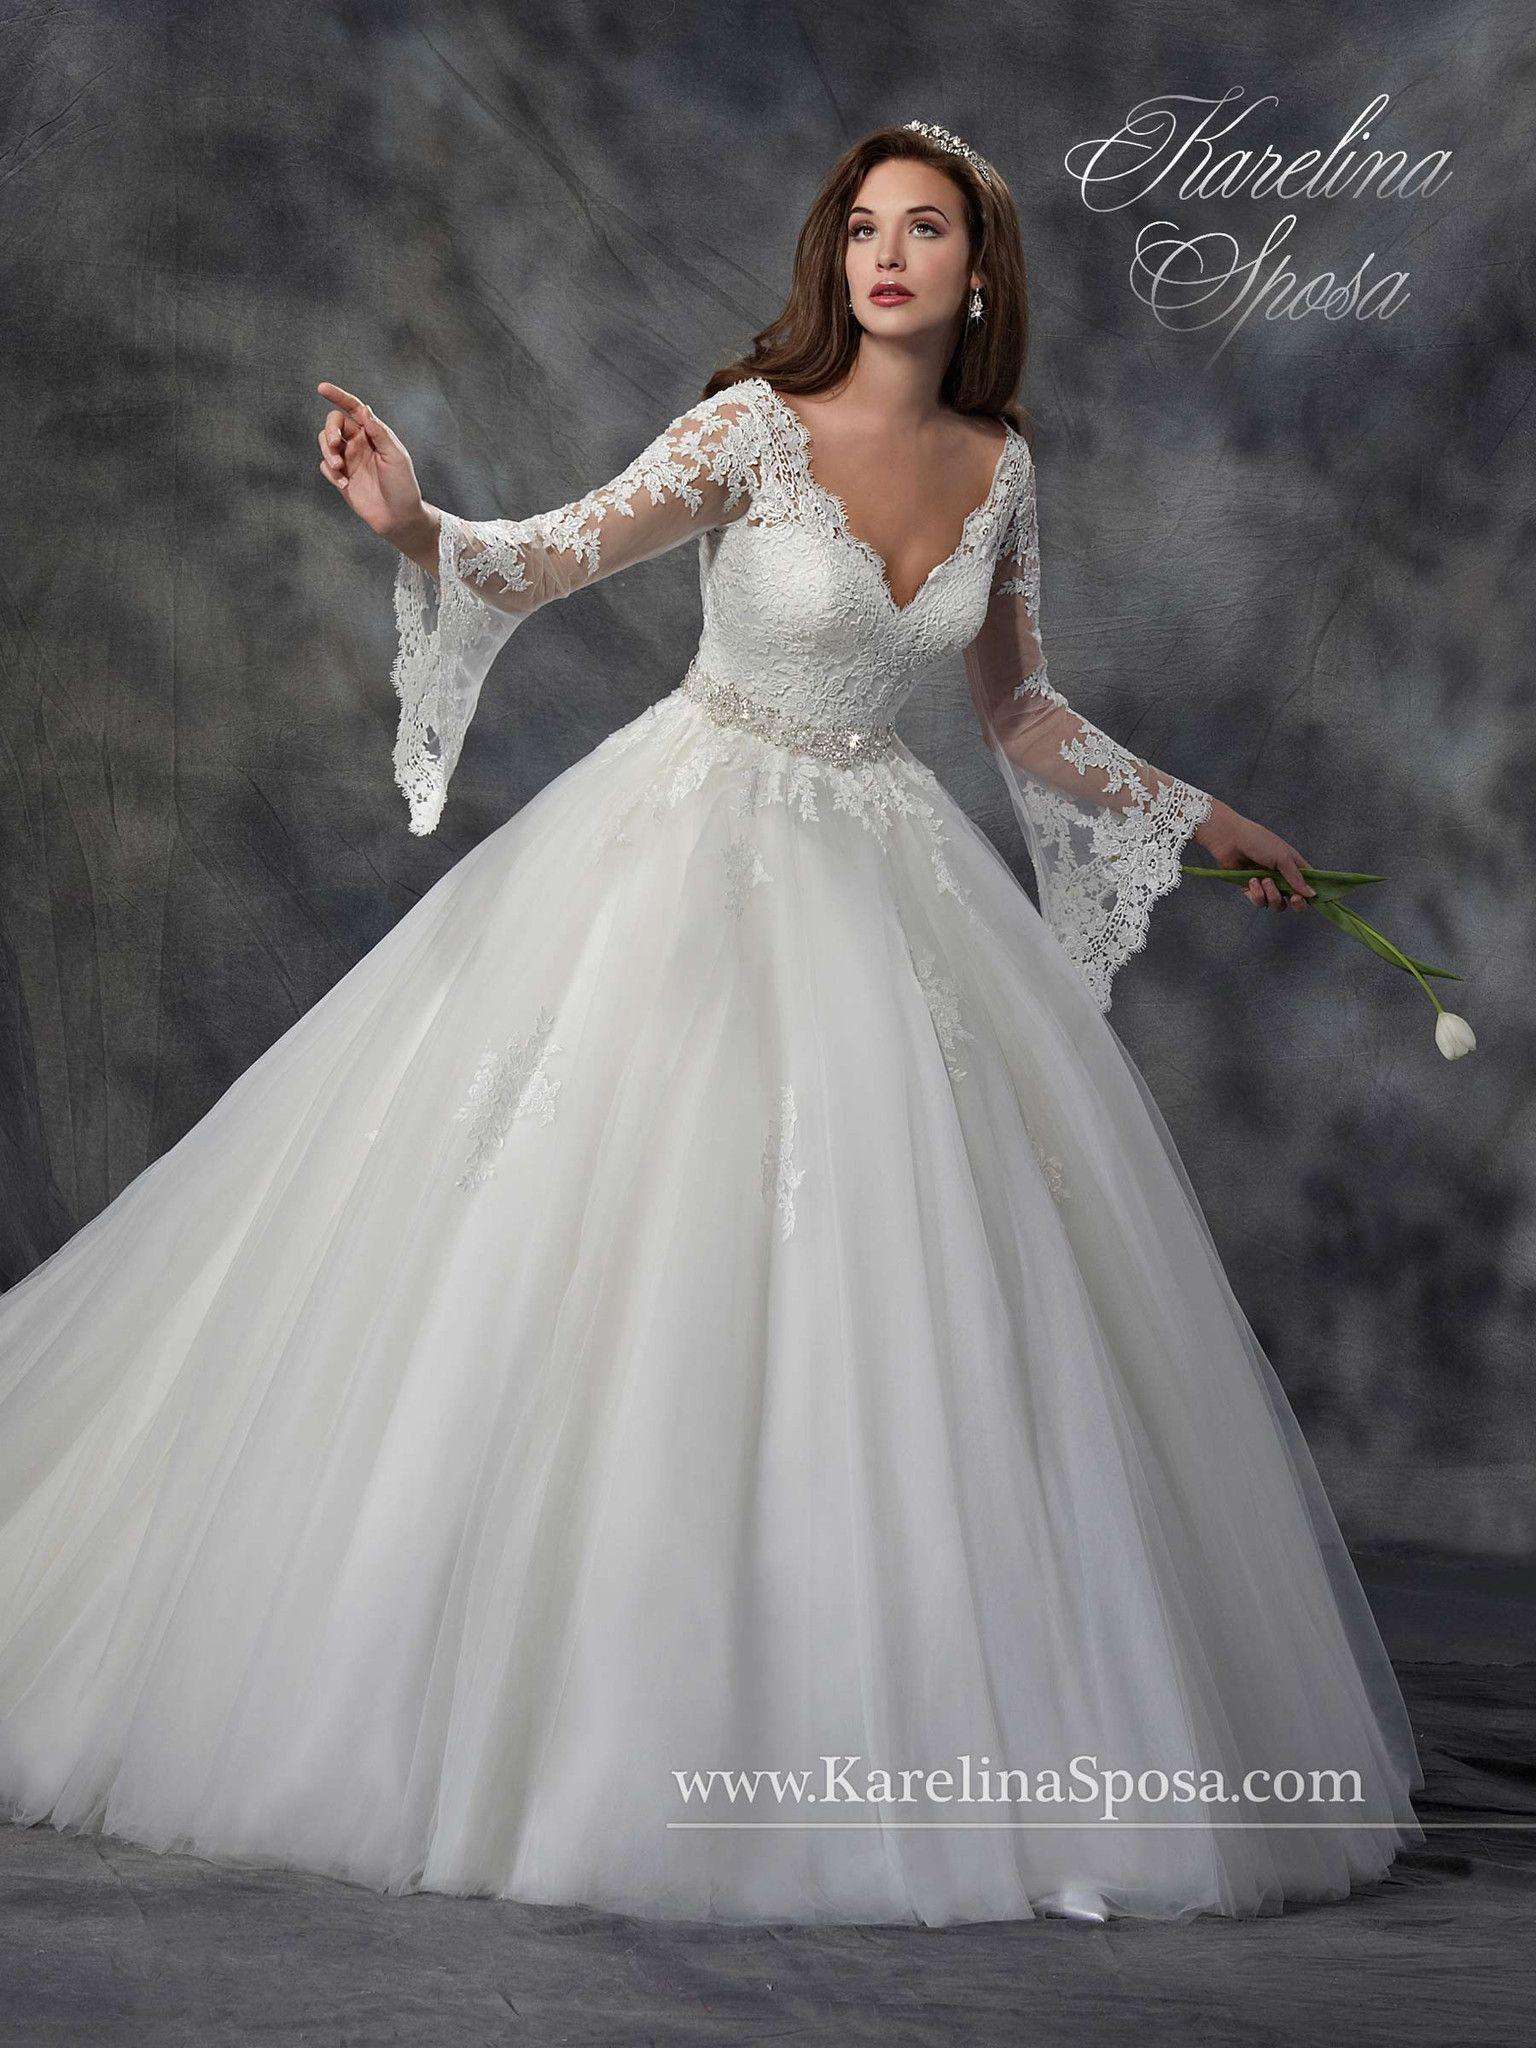 Description: Scallop V-neck bridal ball gown with detachable long ...